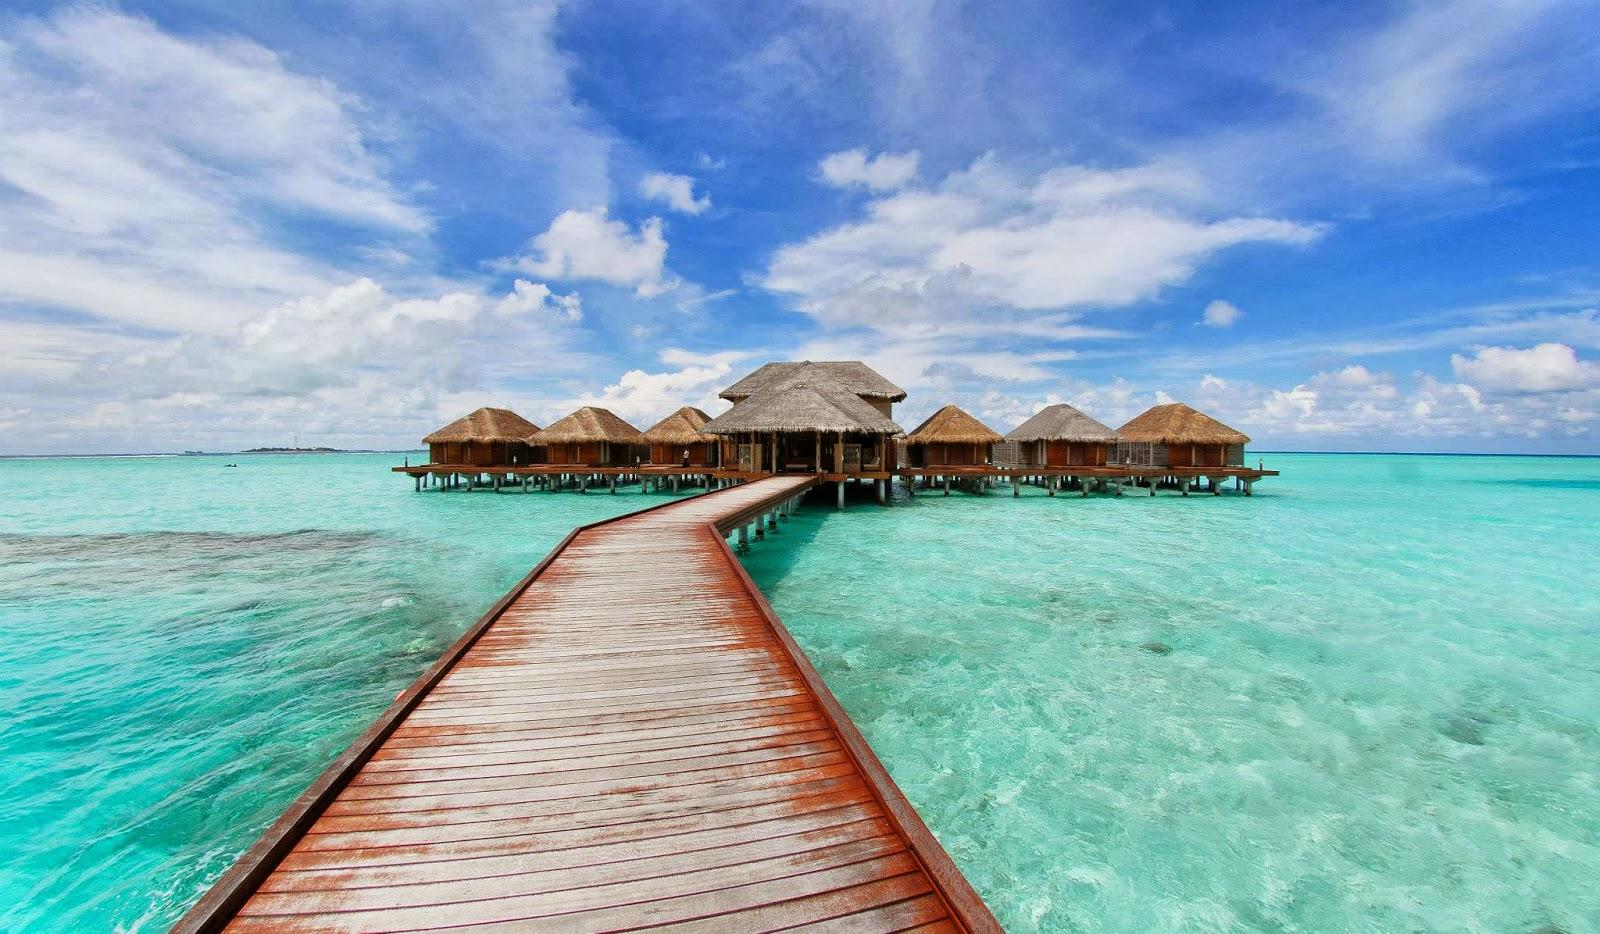 malediven reisen blog luxusurlaub malediven. Black Bedroom Furniture Sets. Home Design Ideas